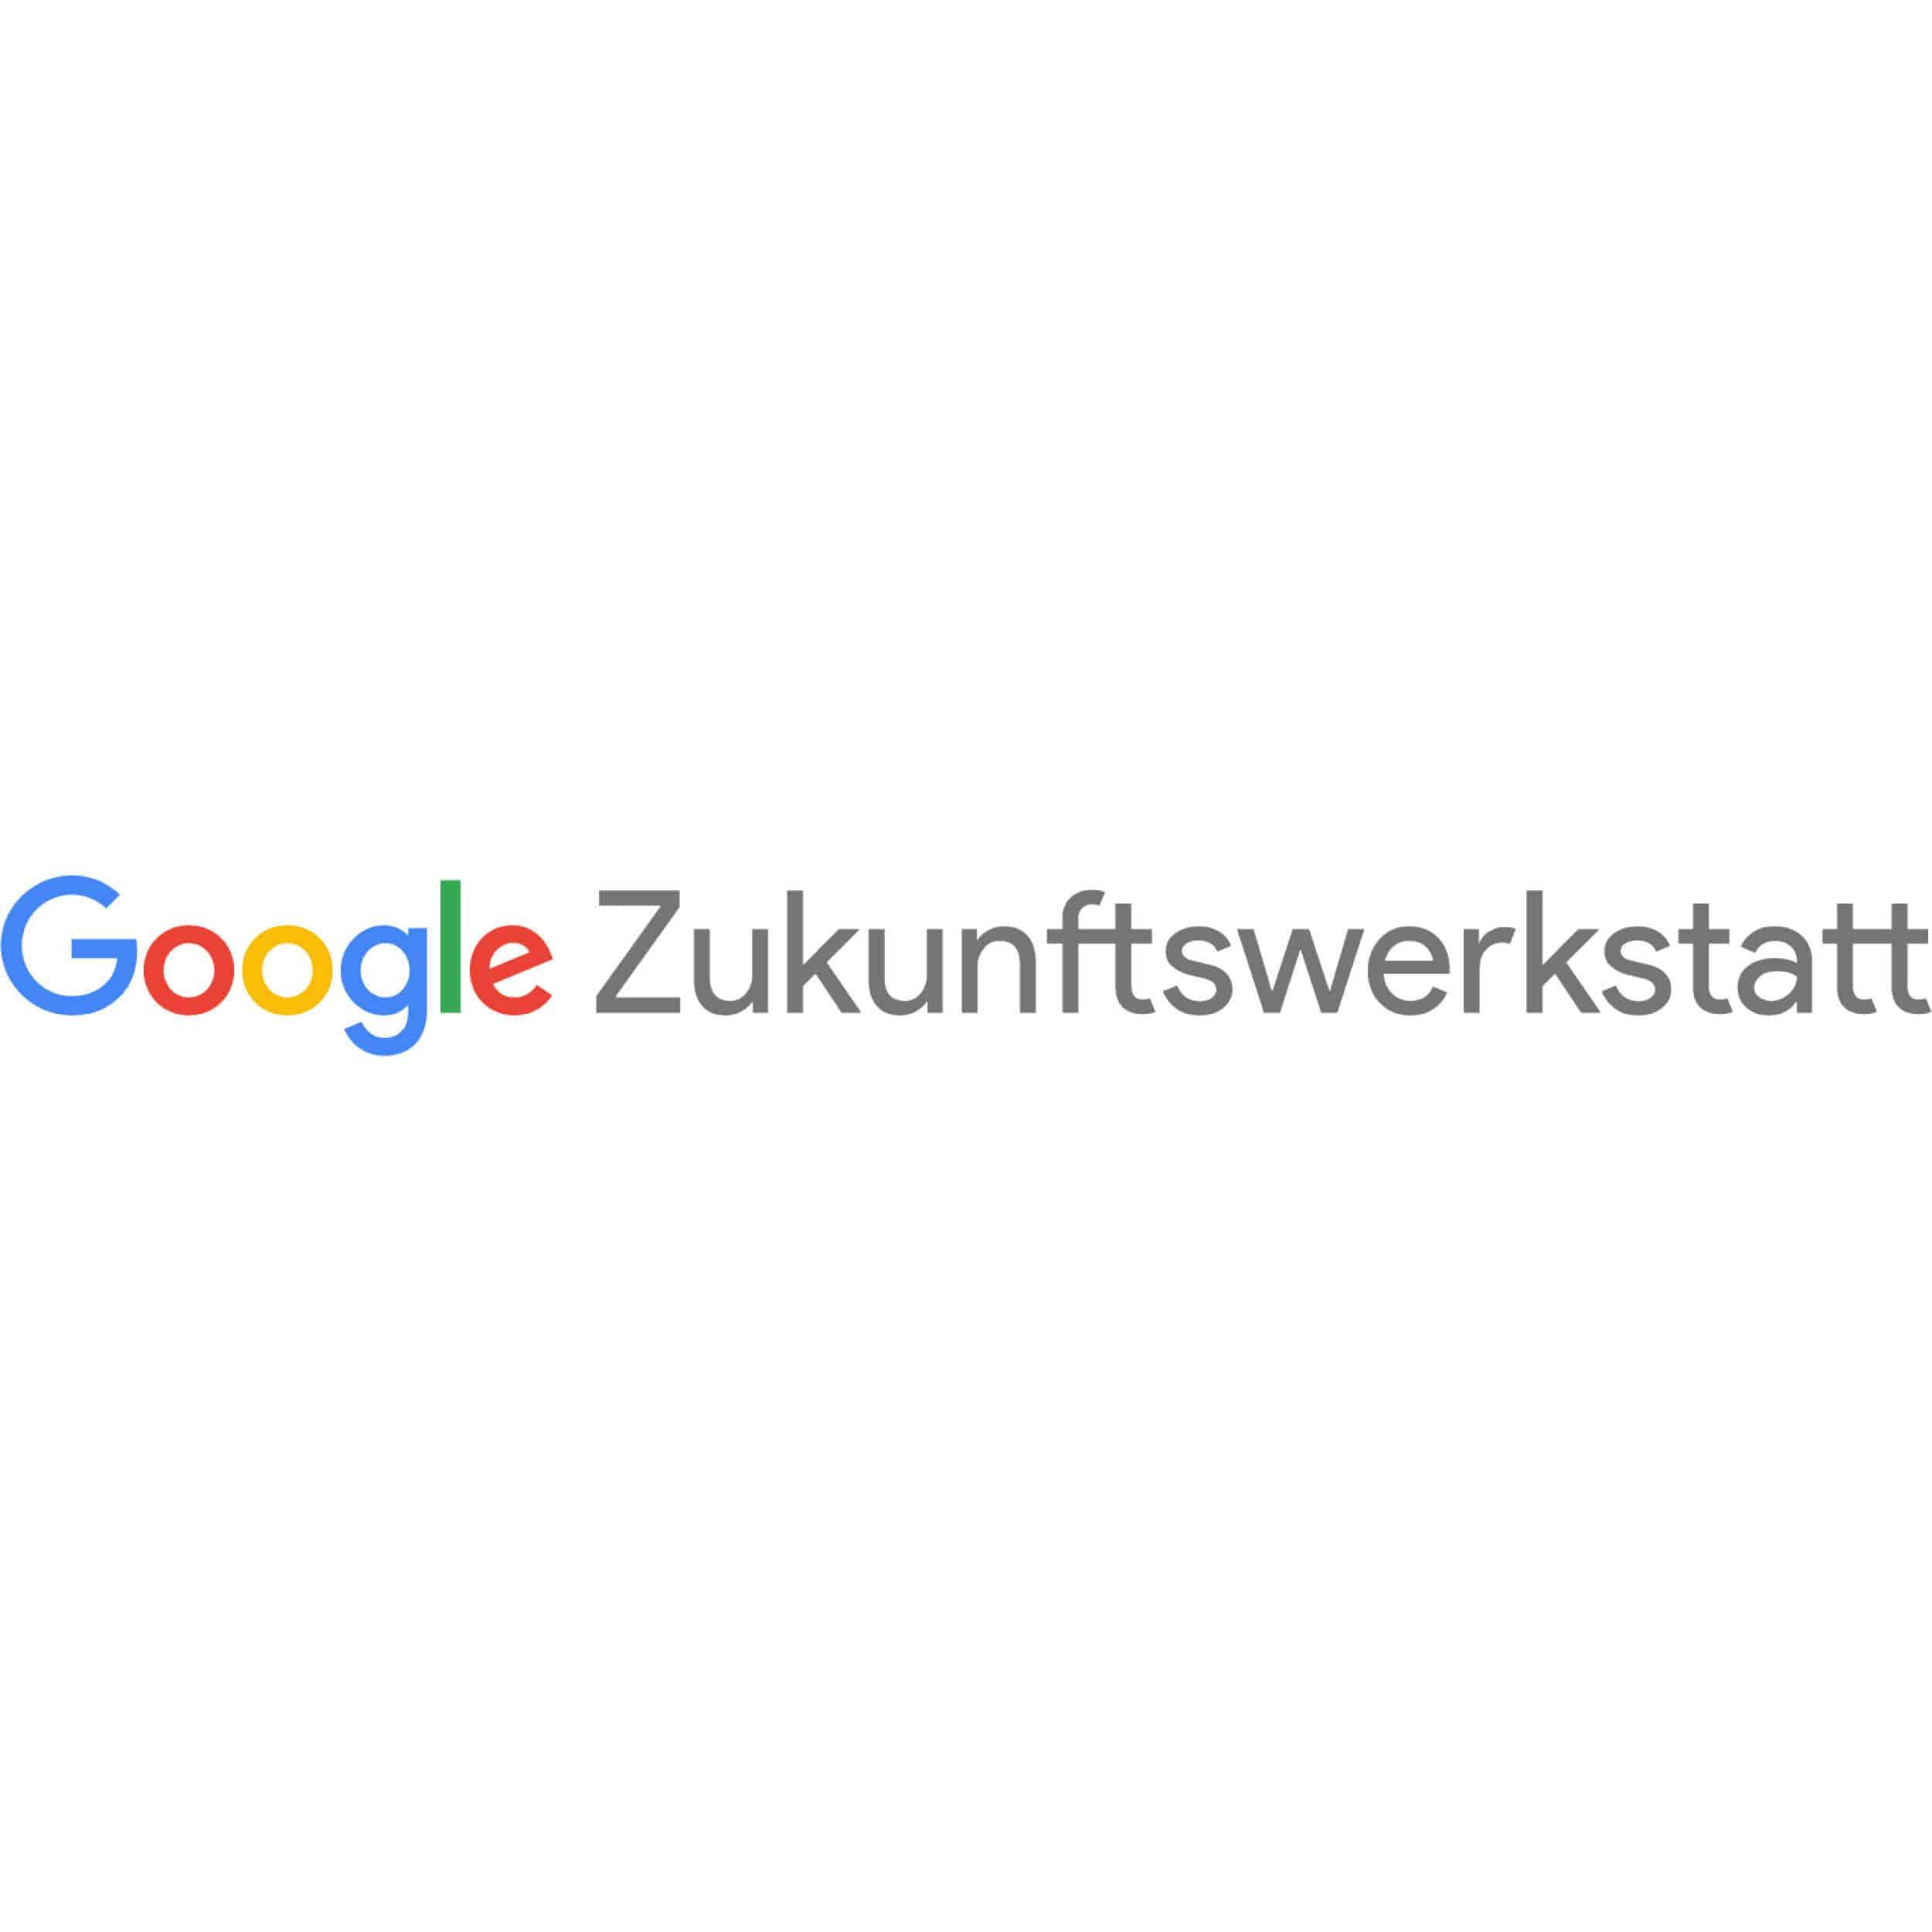 Logo2 Google Zukunftswerkstatt